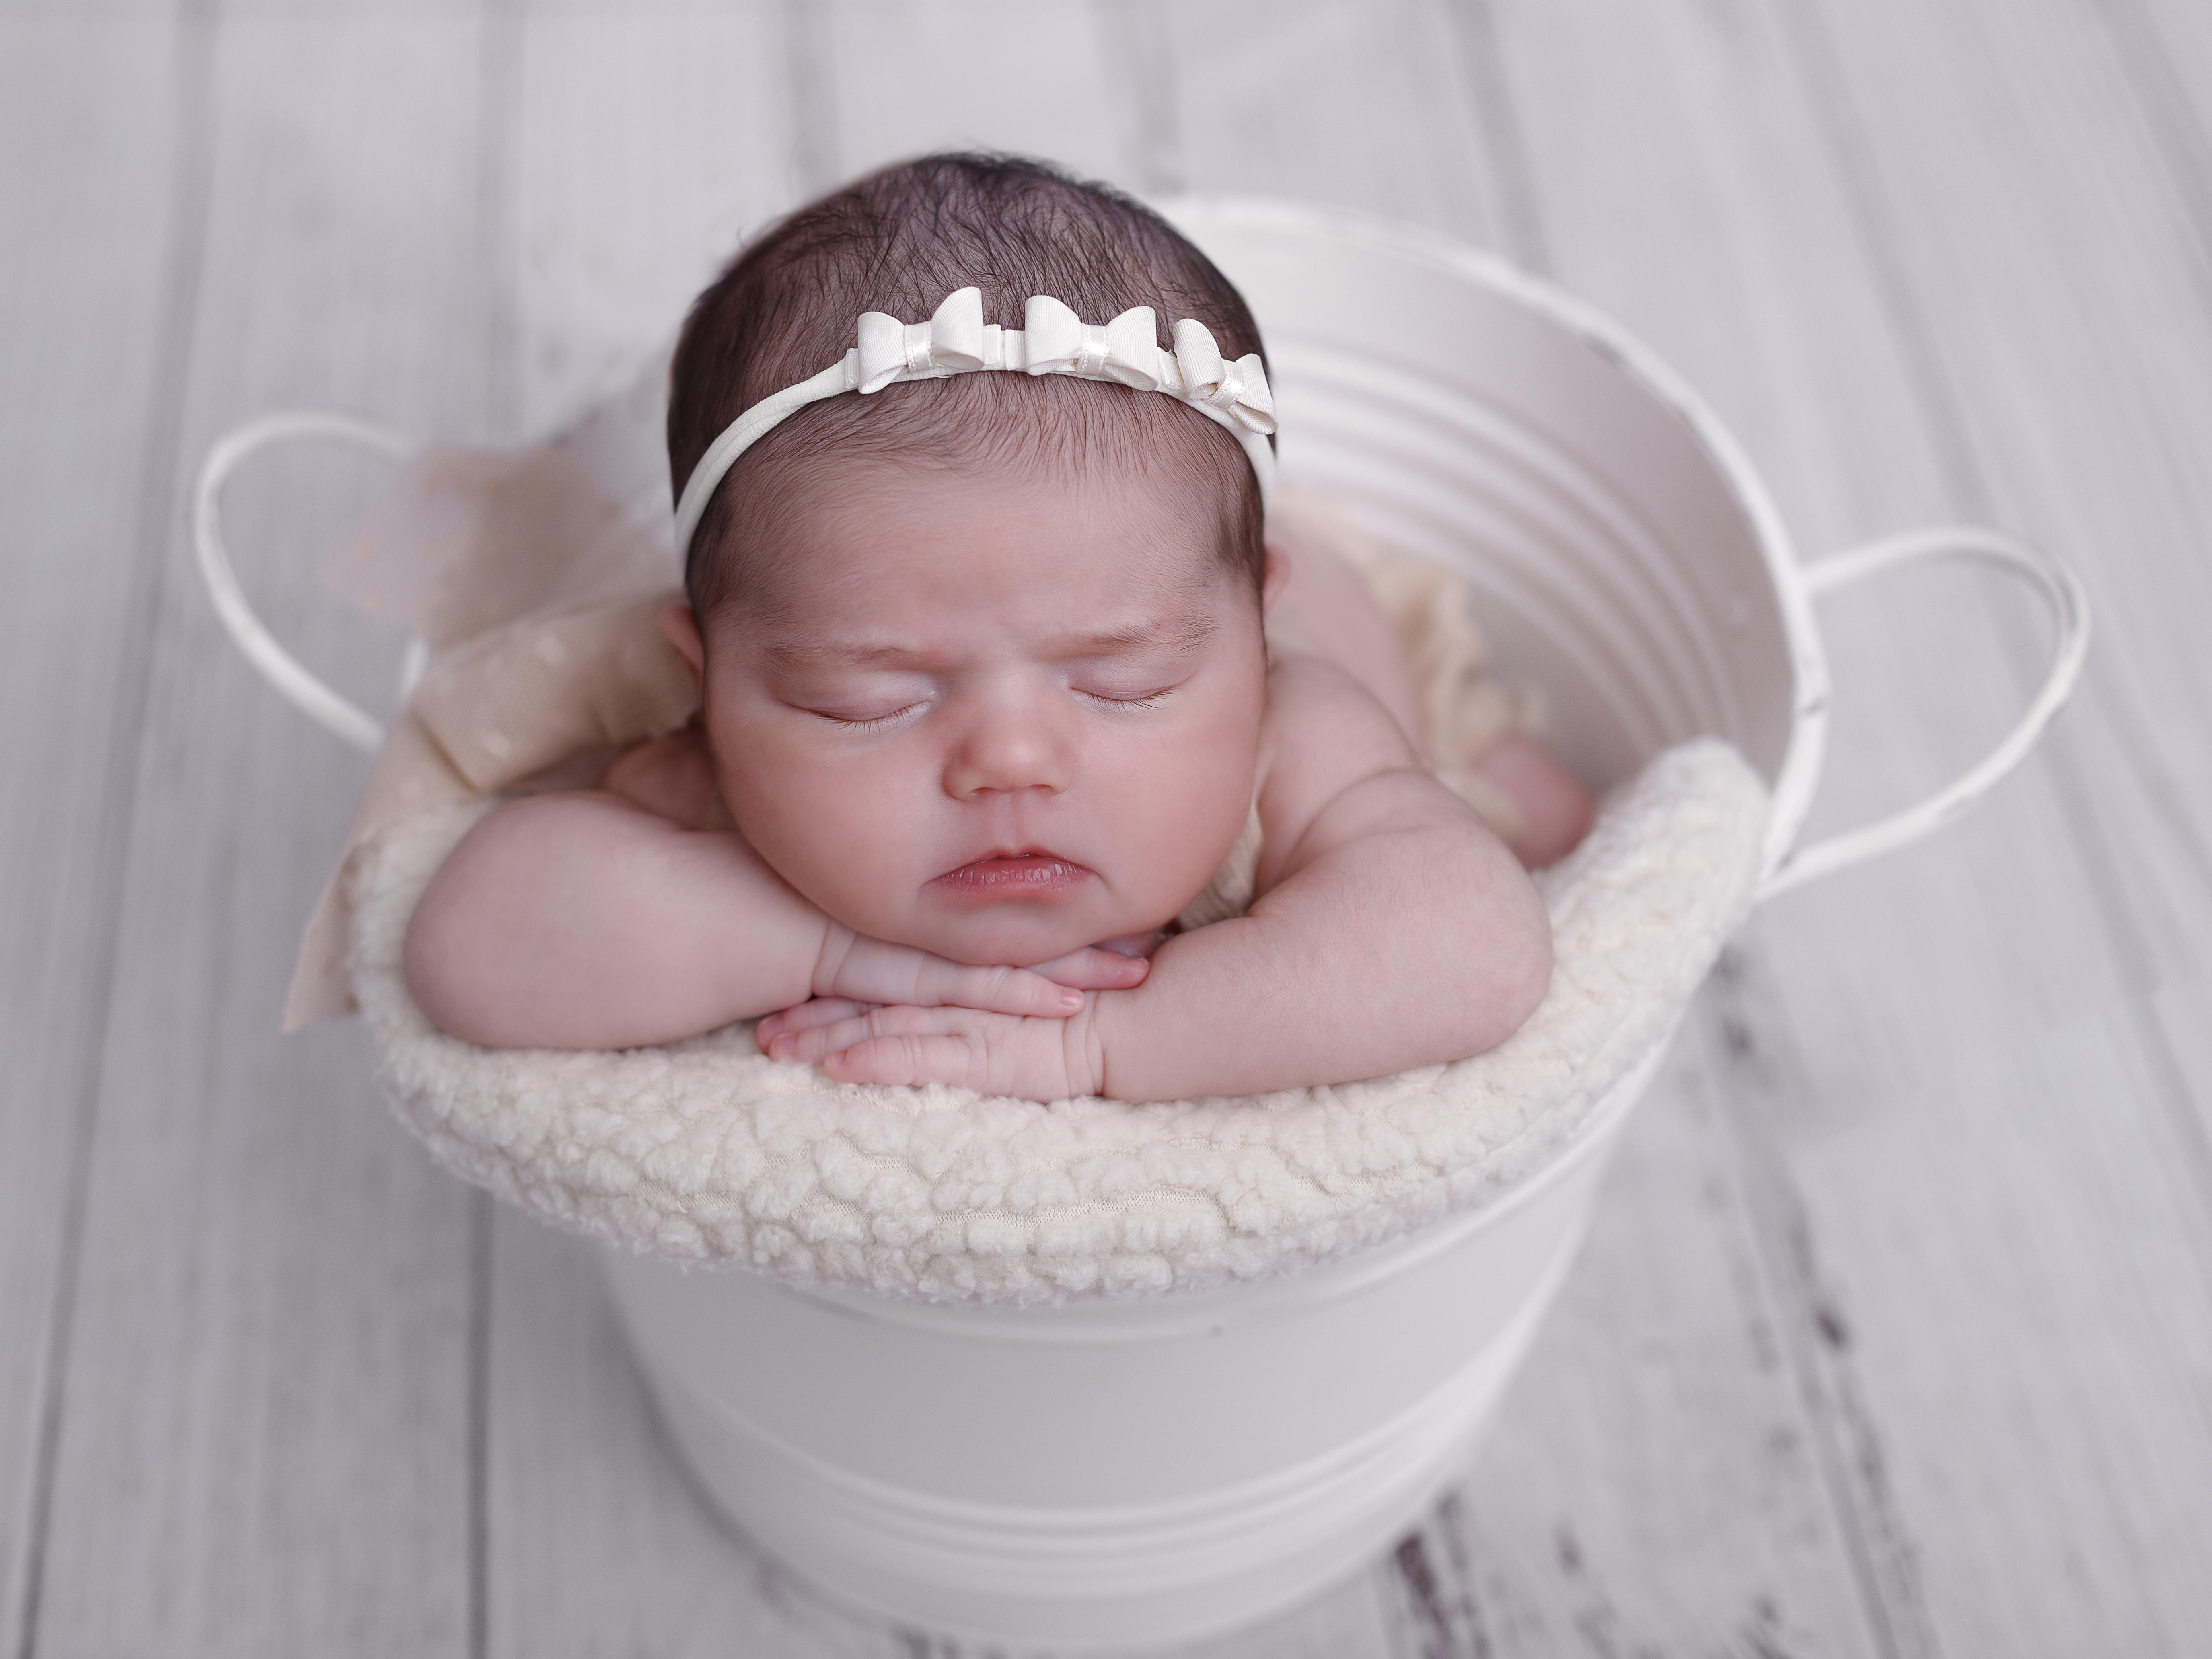 Contate Karin Marcitello -  Fotografia no Ipiranga - Gestante, Newborn e Família